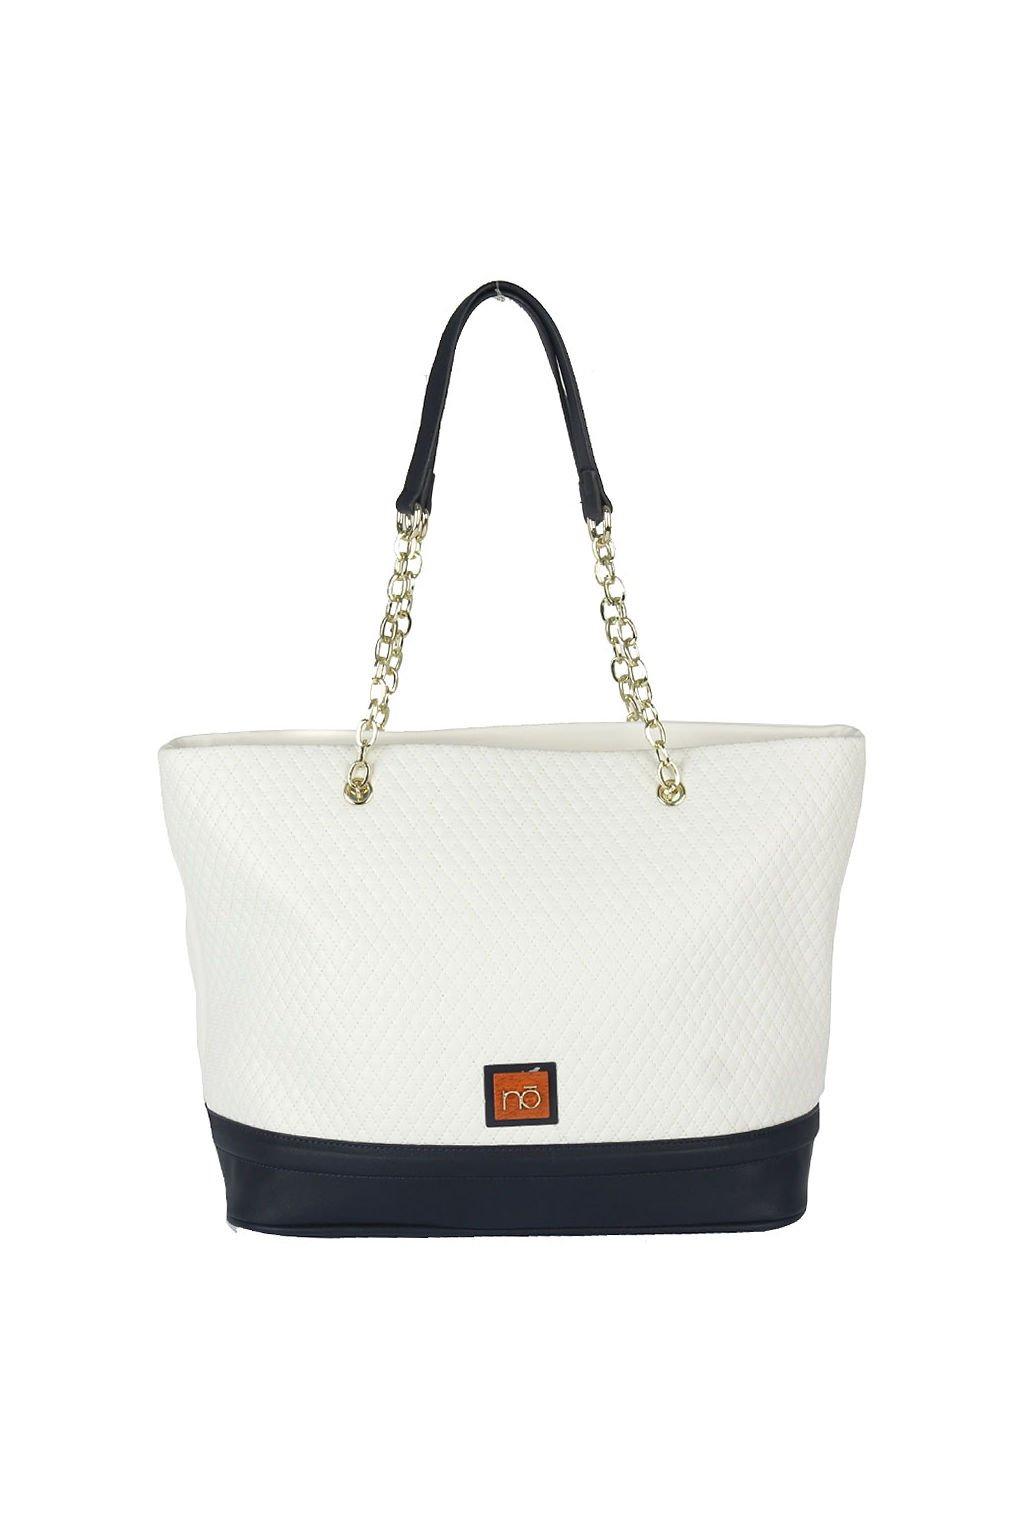 Bílá prošívaná kabelka Nobo NOB 0630 W17